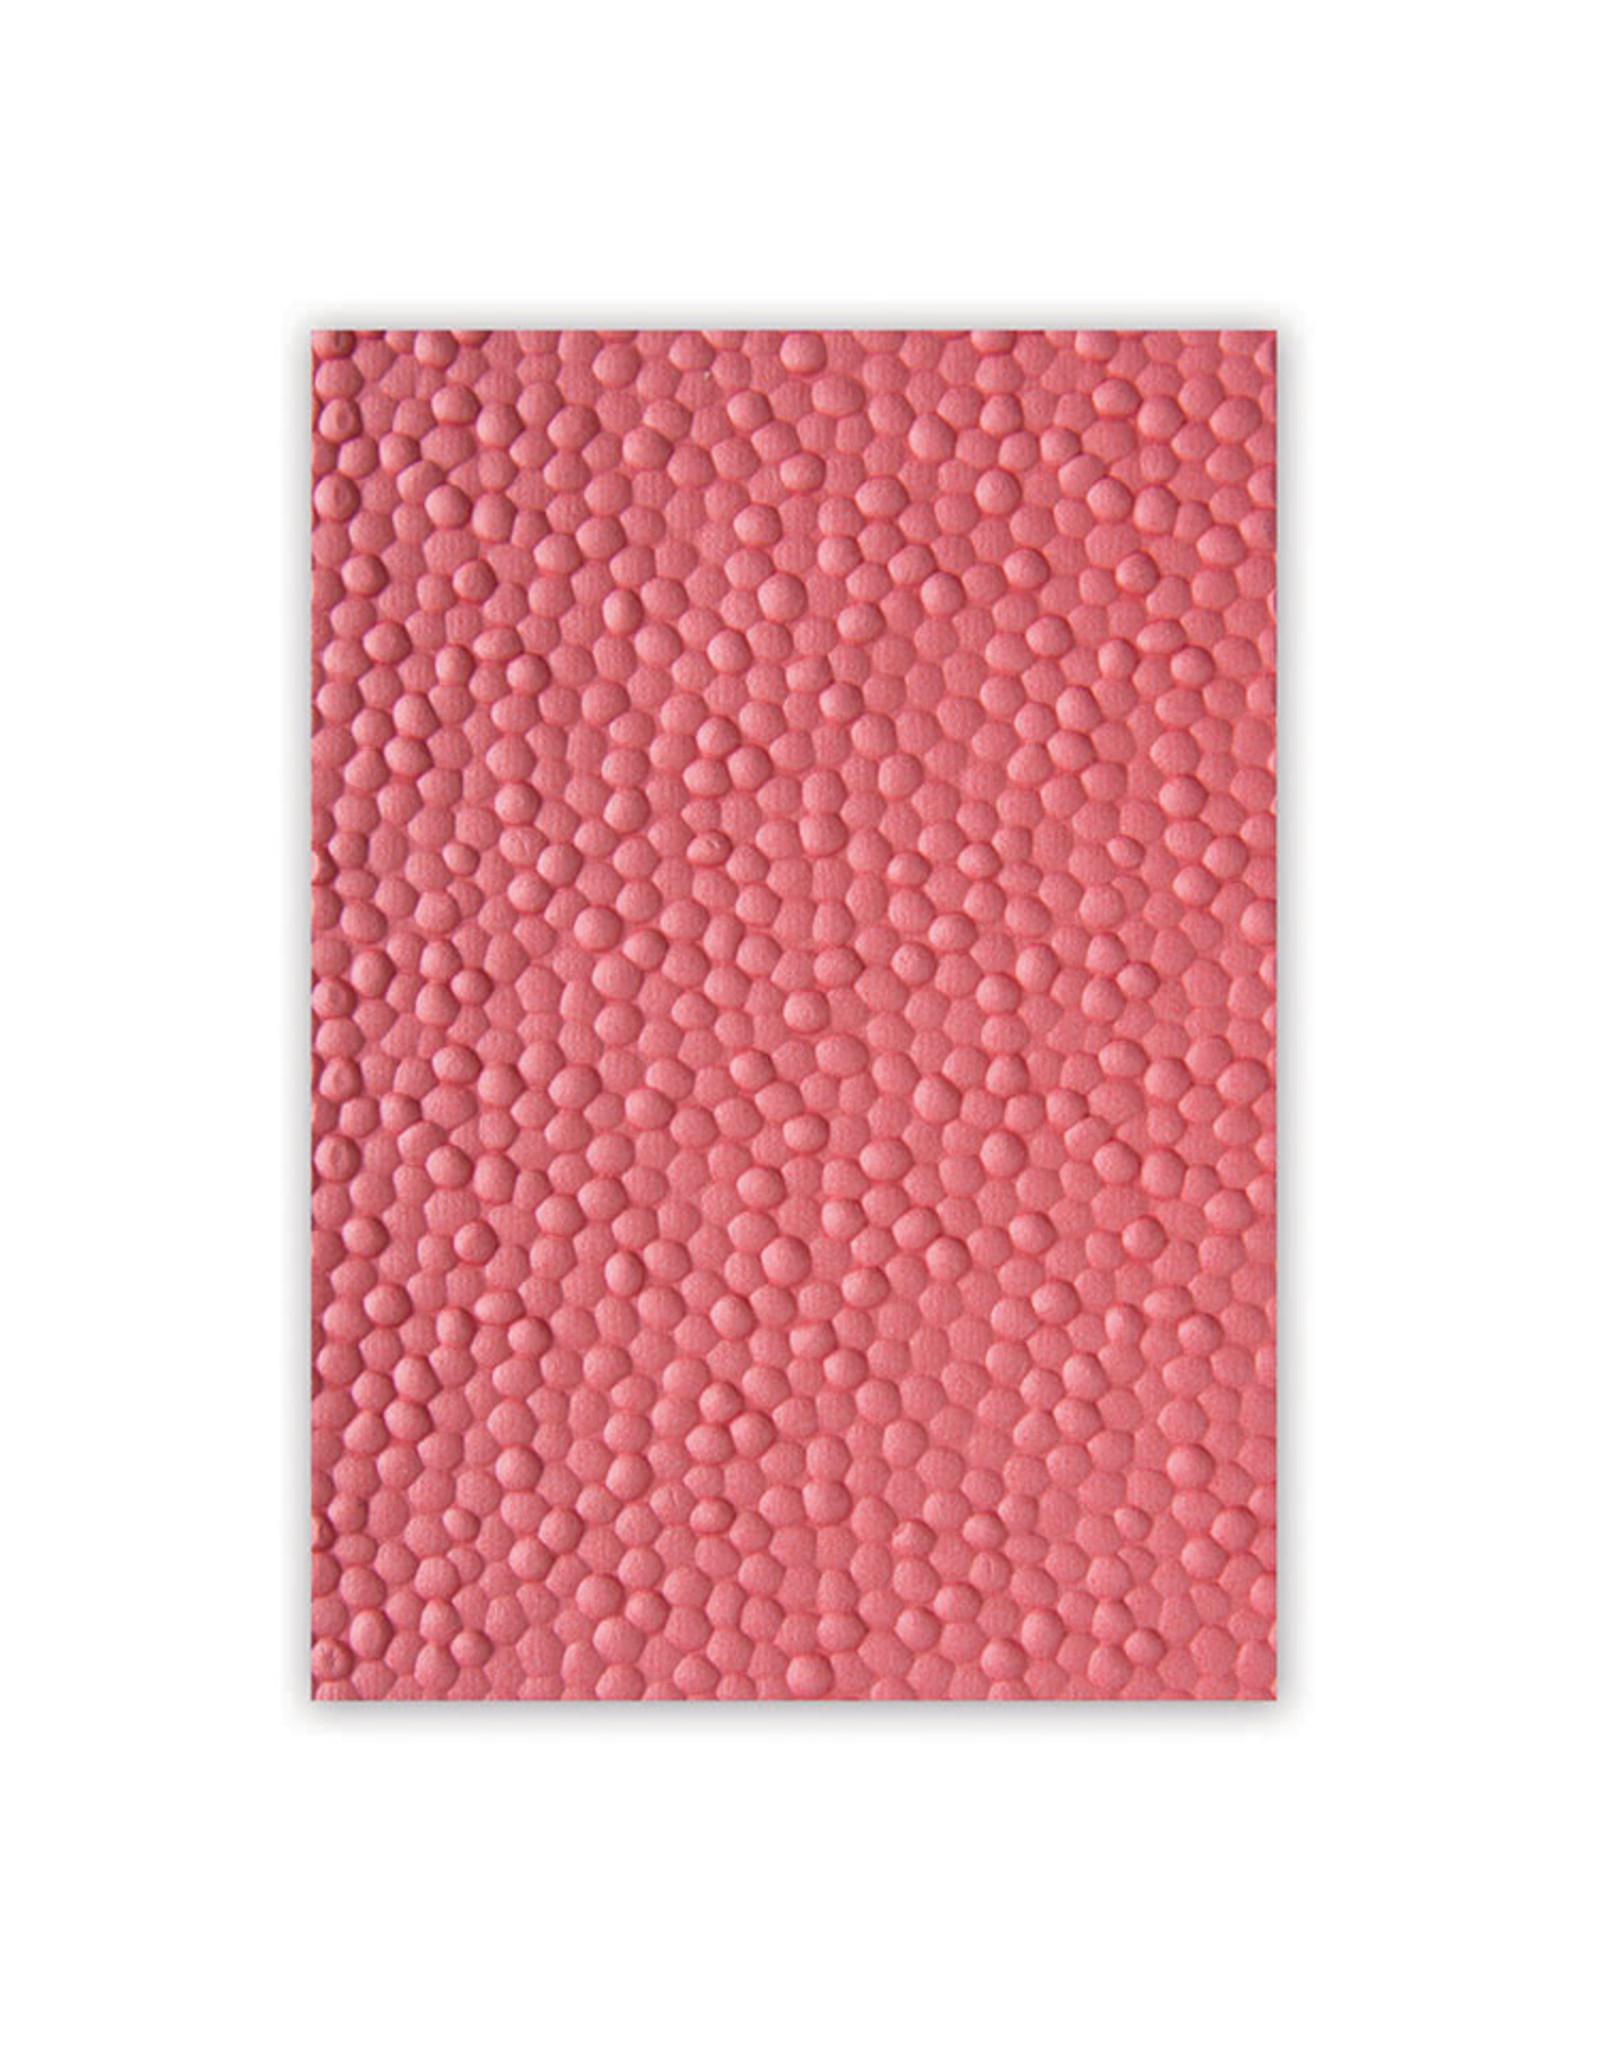 Ellison/Sizzix Cobblestone - 3D Textured Impressions Embossing Folder